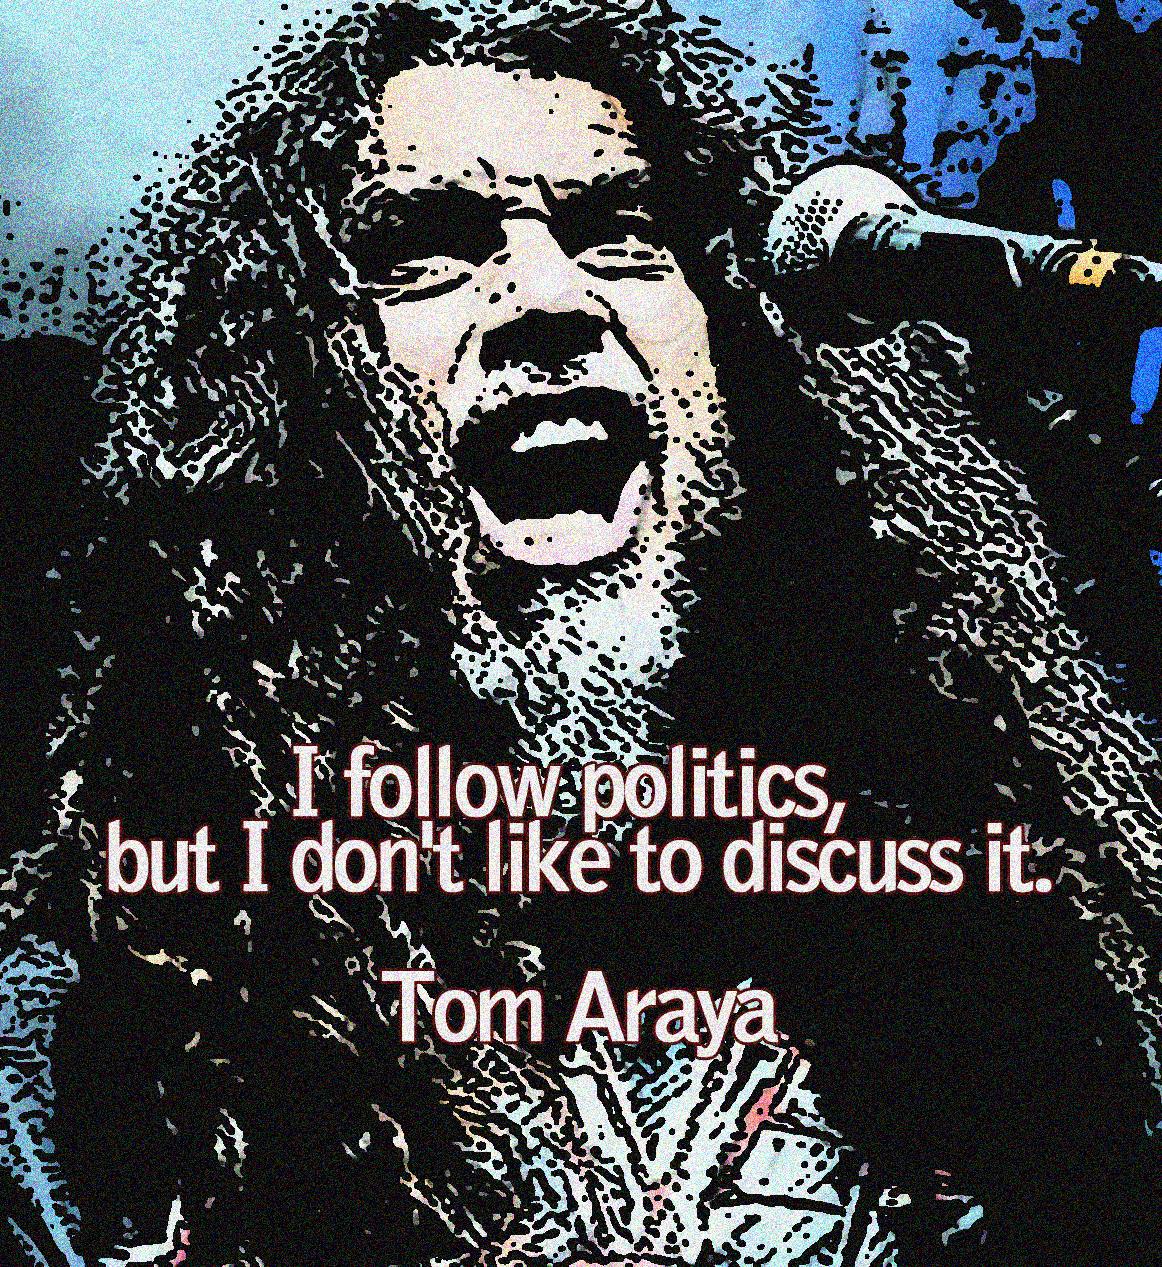 Tom Araya's quote #8